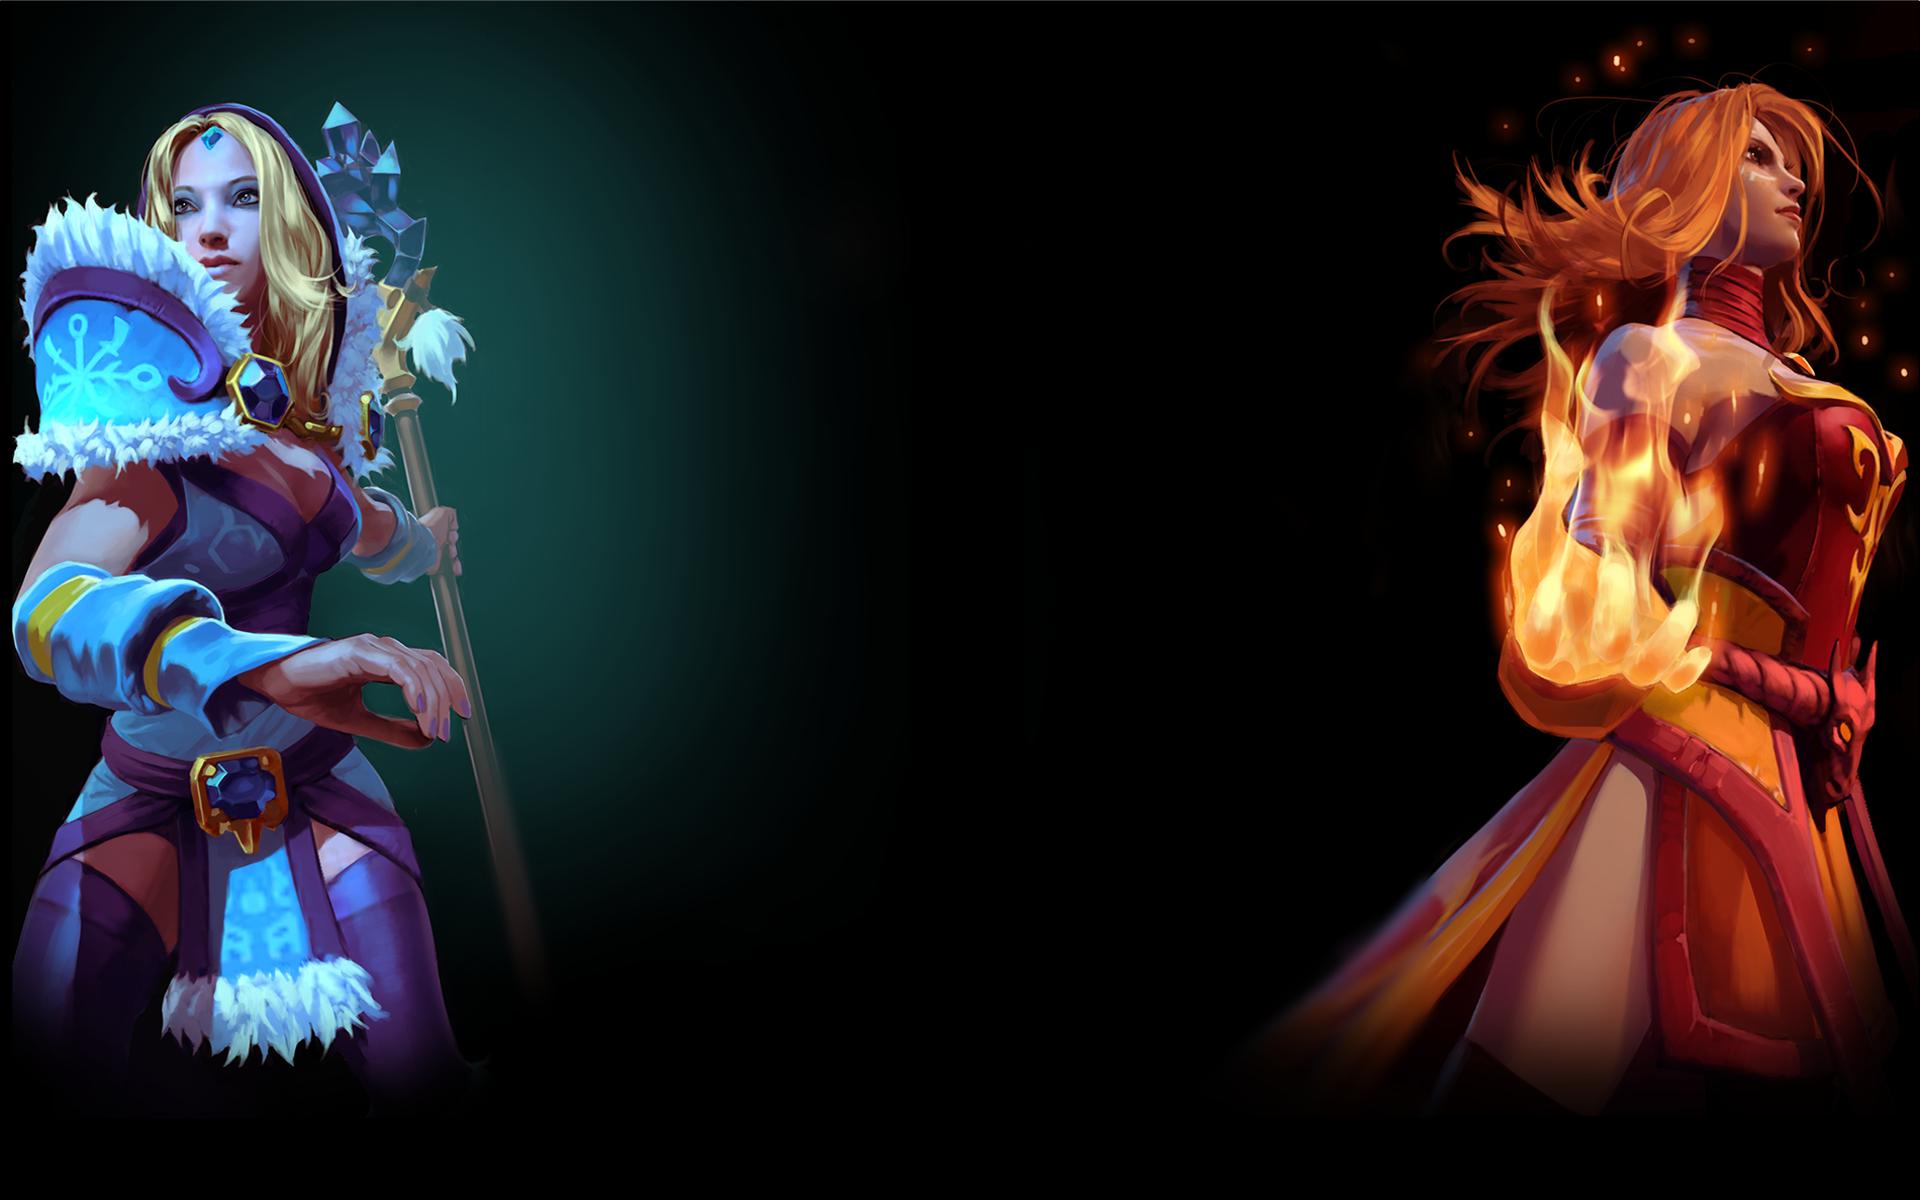 Crystal Maiden & Lina